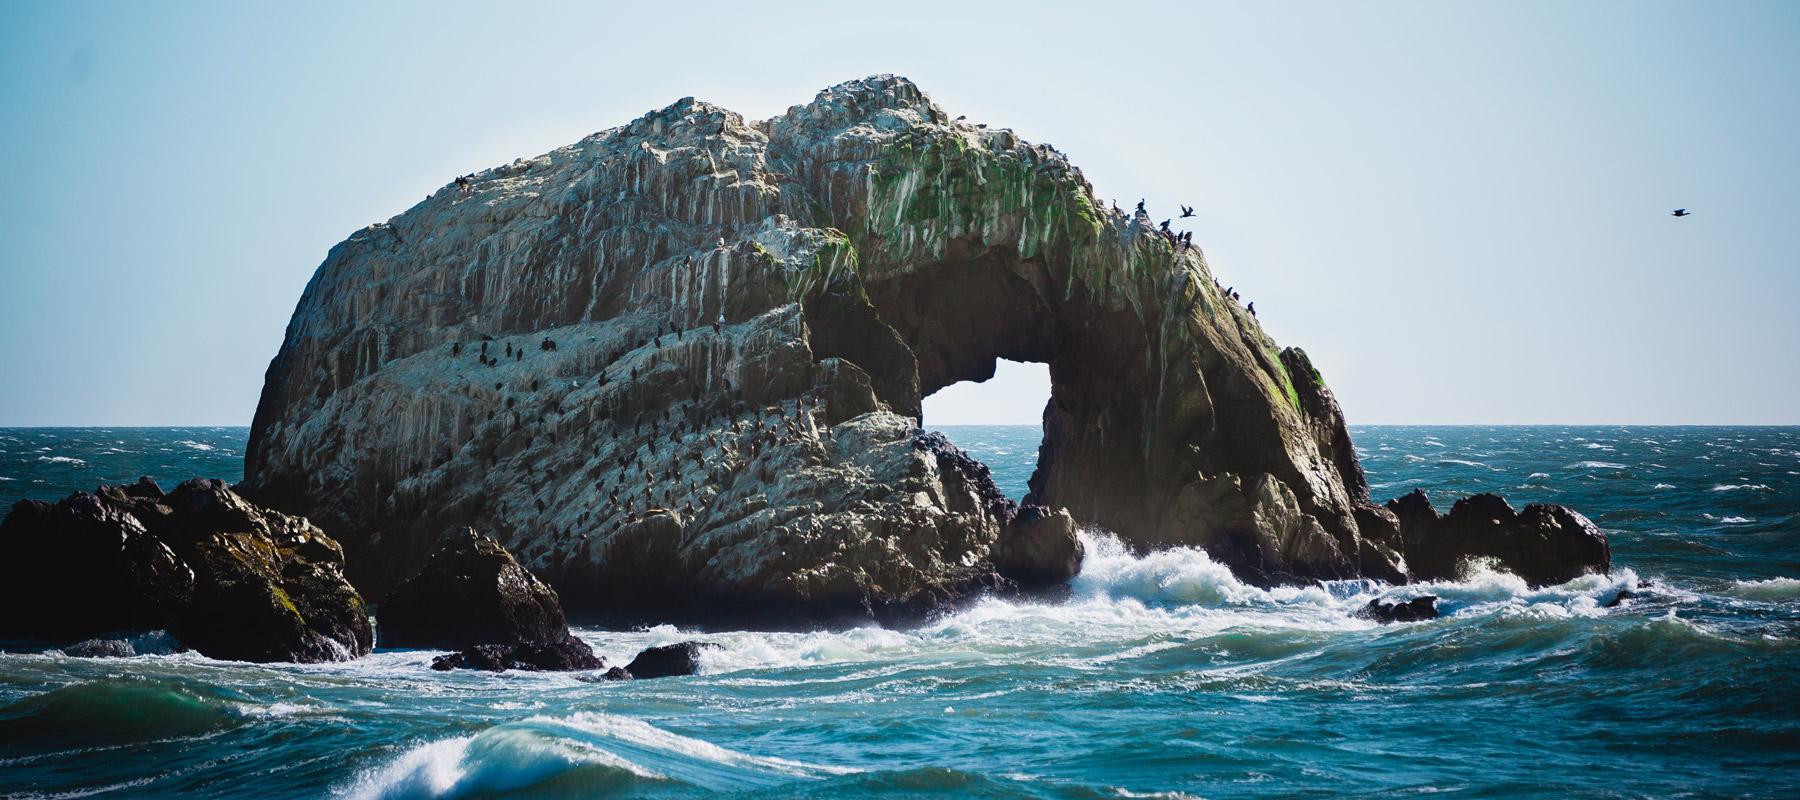 Water next to the ocean - Rock